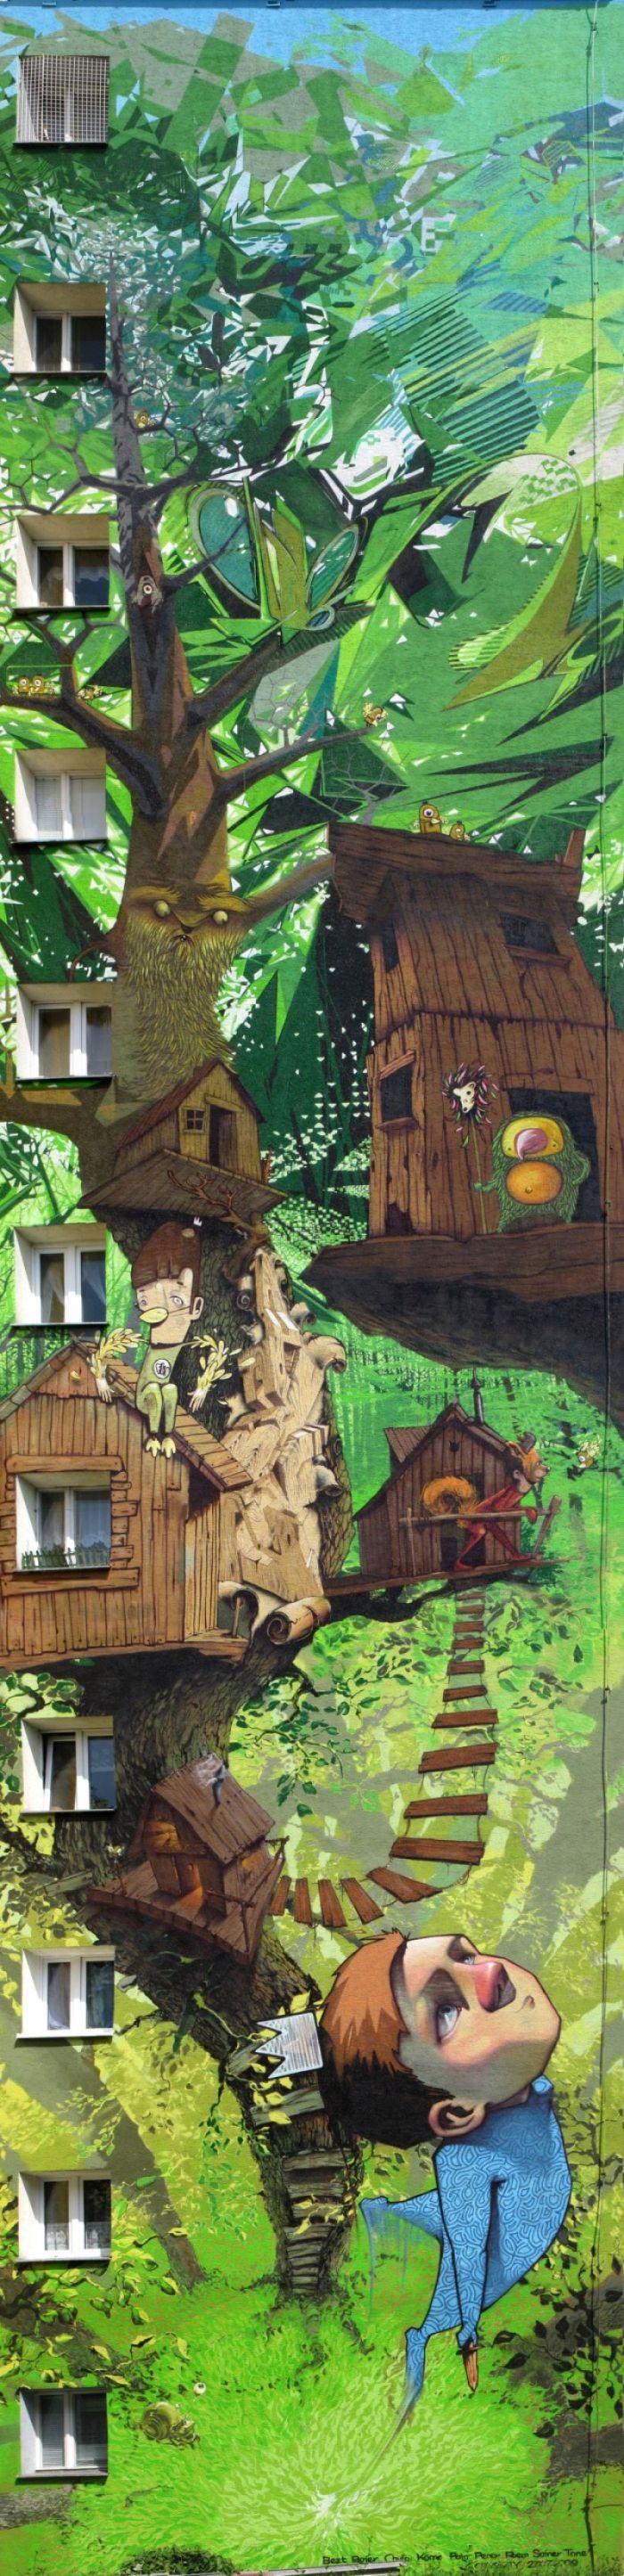 Креативная роспись домов (16 фото)